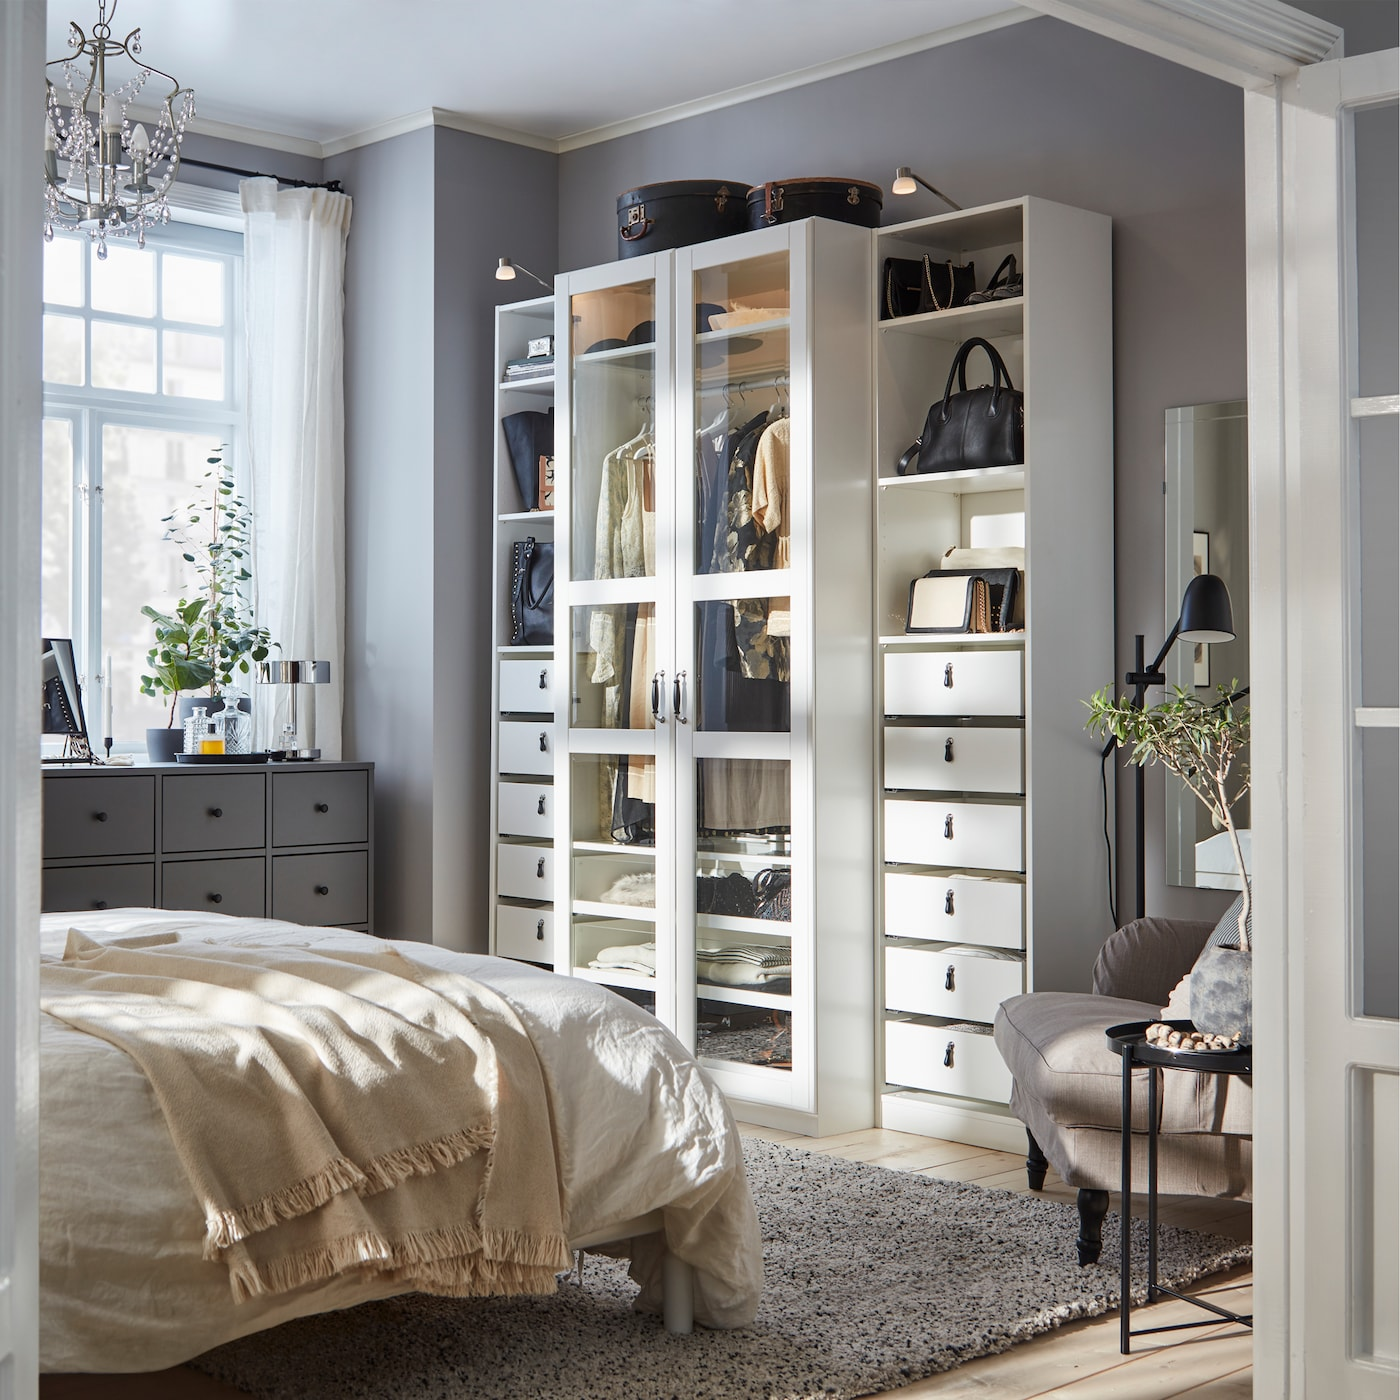 Stylish storage with IKEA PAX/TYSSEDAL wardrobe - IKEA